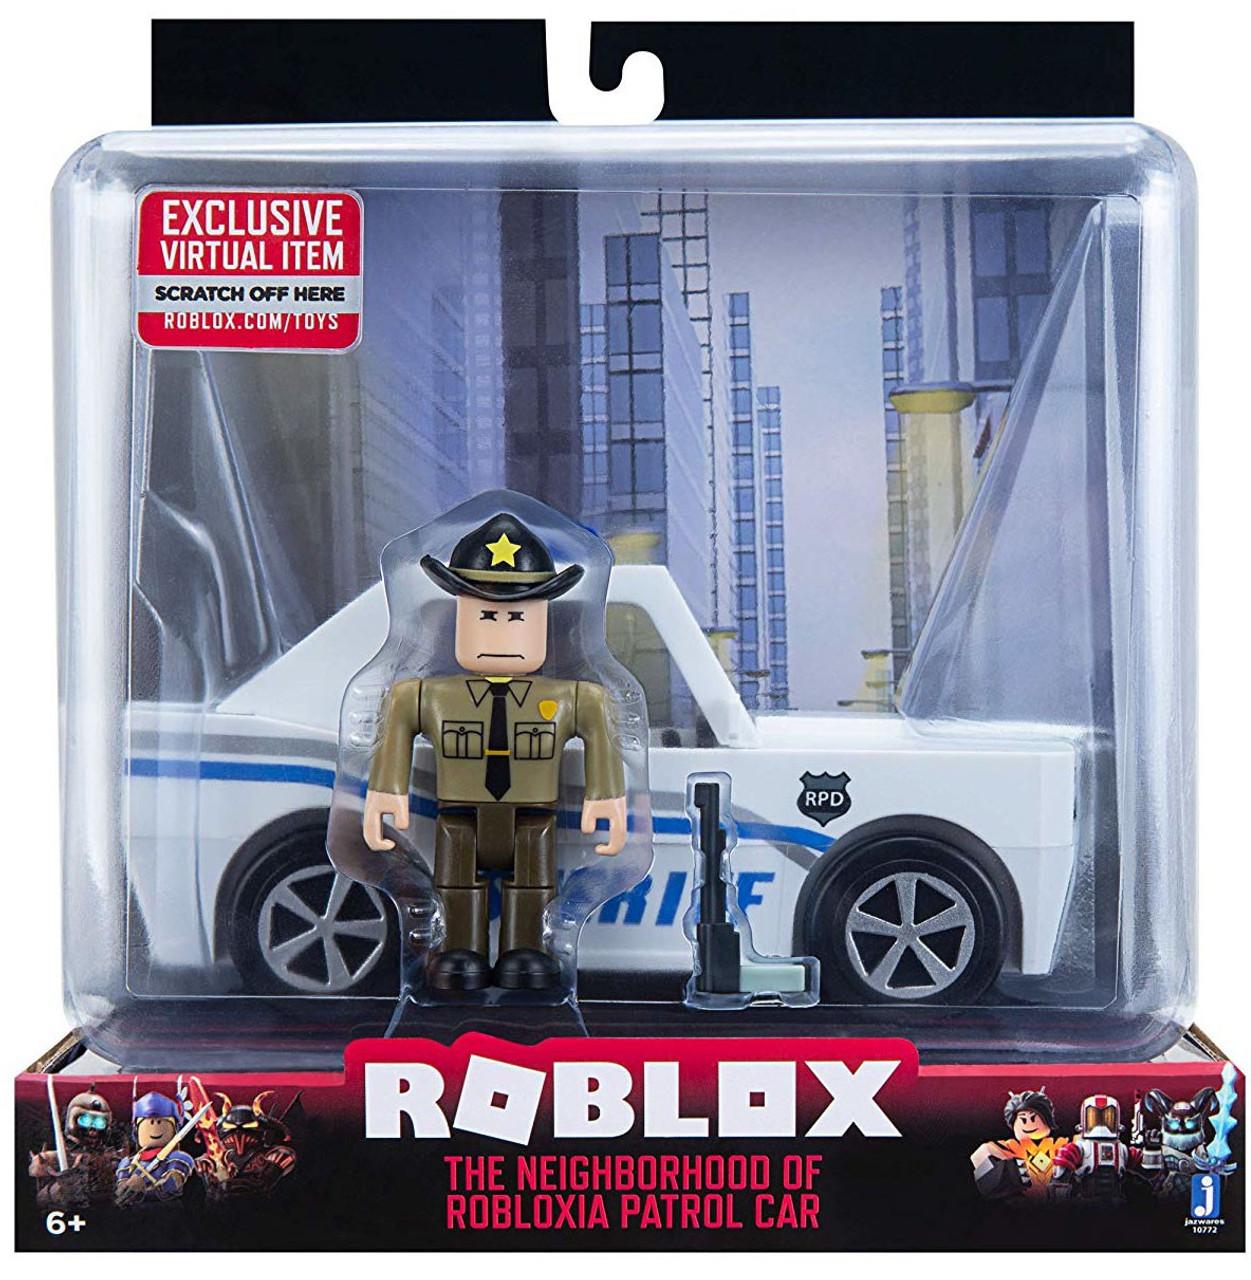 Codes Roblox Neighborhood Robloxia